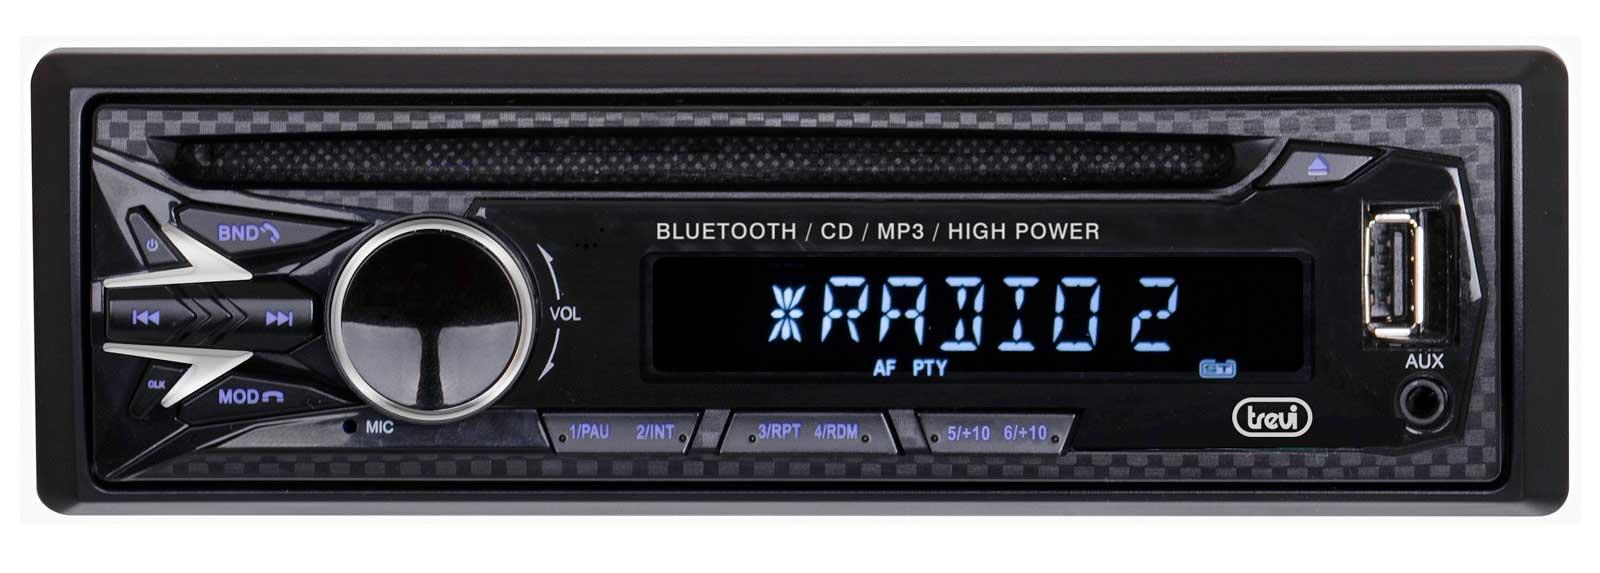 Autoradio Stereo Trevi XCD 5770 USB